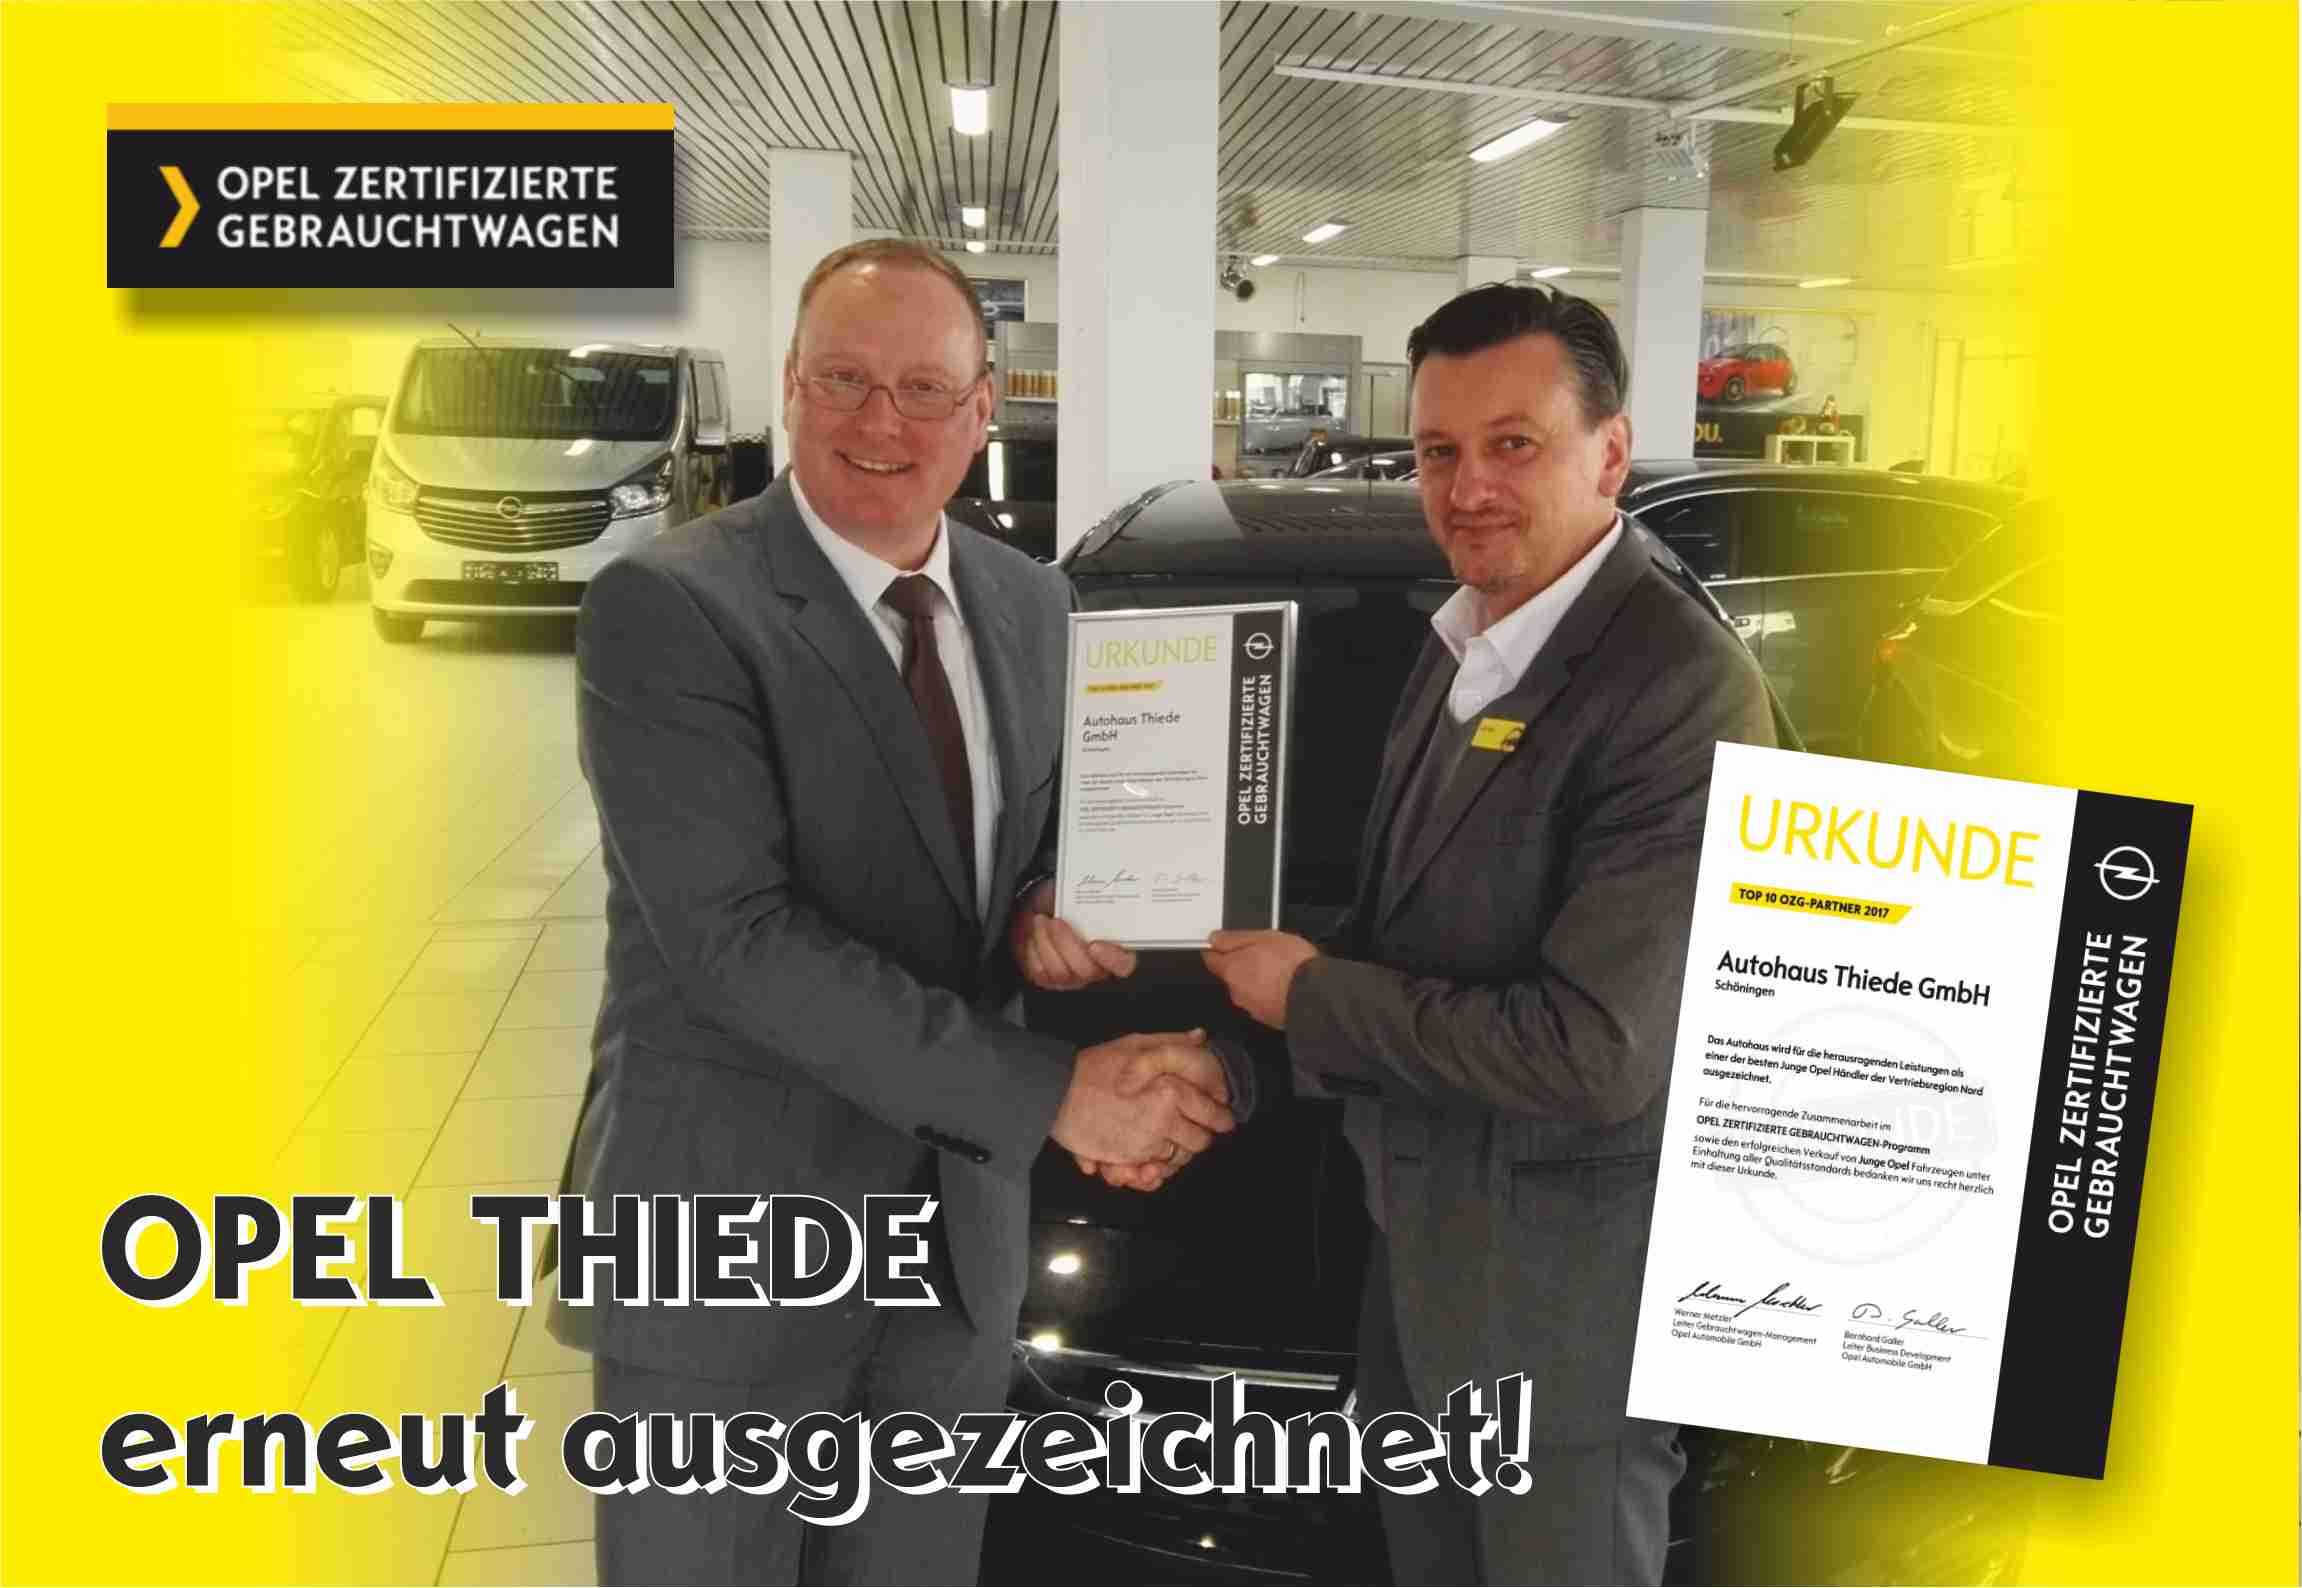 Opel zertifizierte Gebrauchtwagen Opel Thiede Schoeningen JUNGE OPEL Mietwagen Leasing